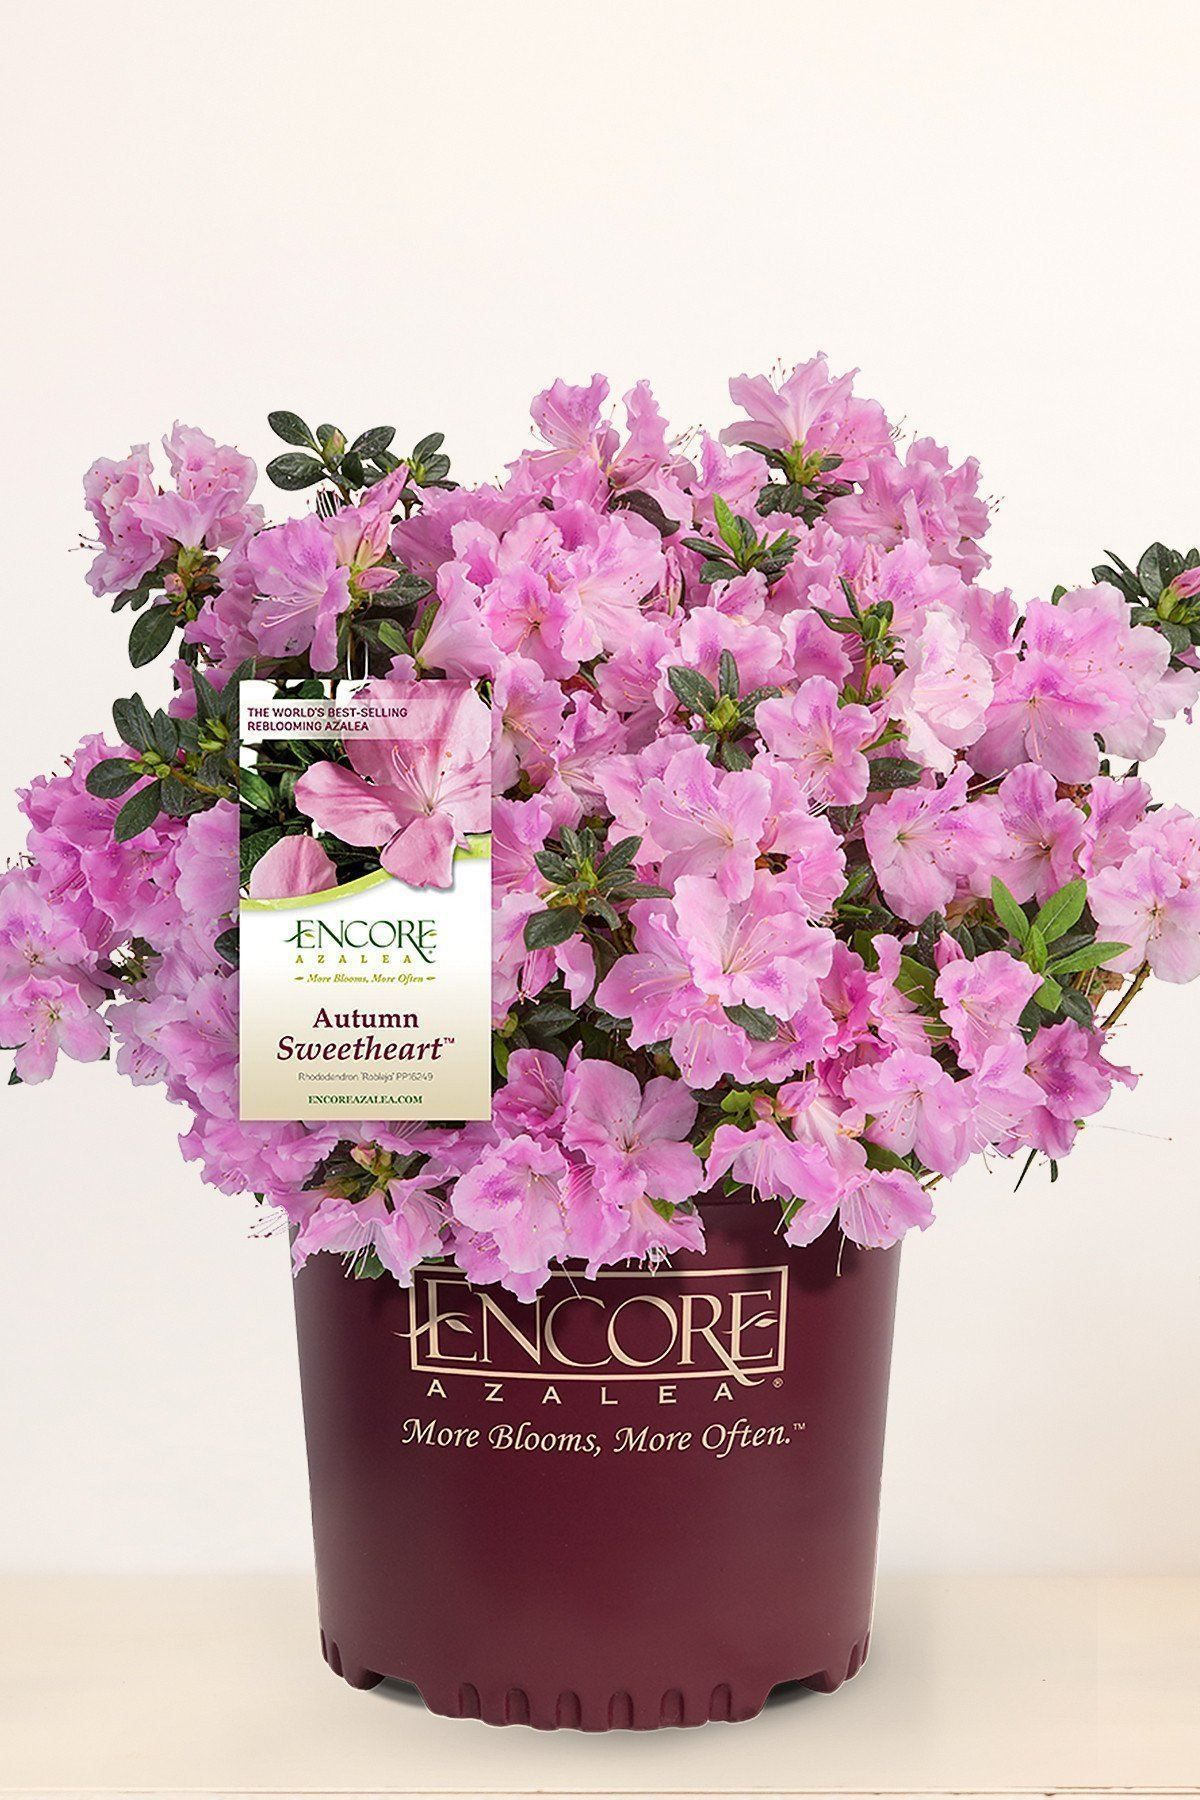 Buy Encore® Azalea Autumn Sweetheart at Root 98 Warehouse